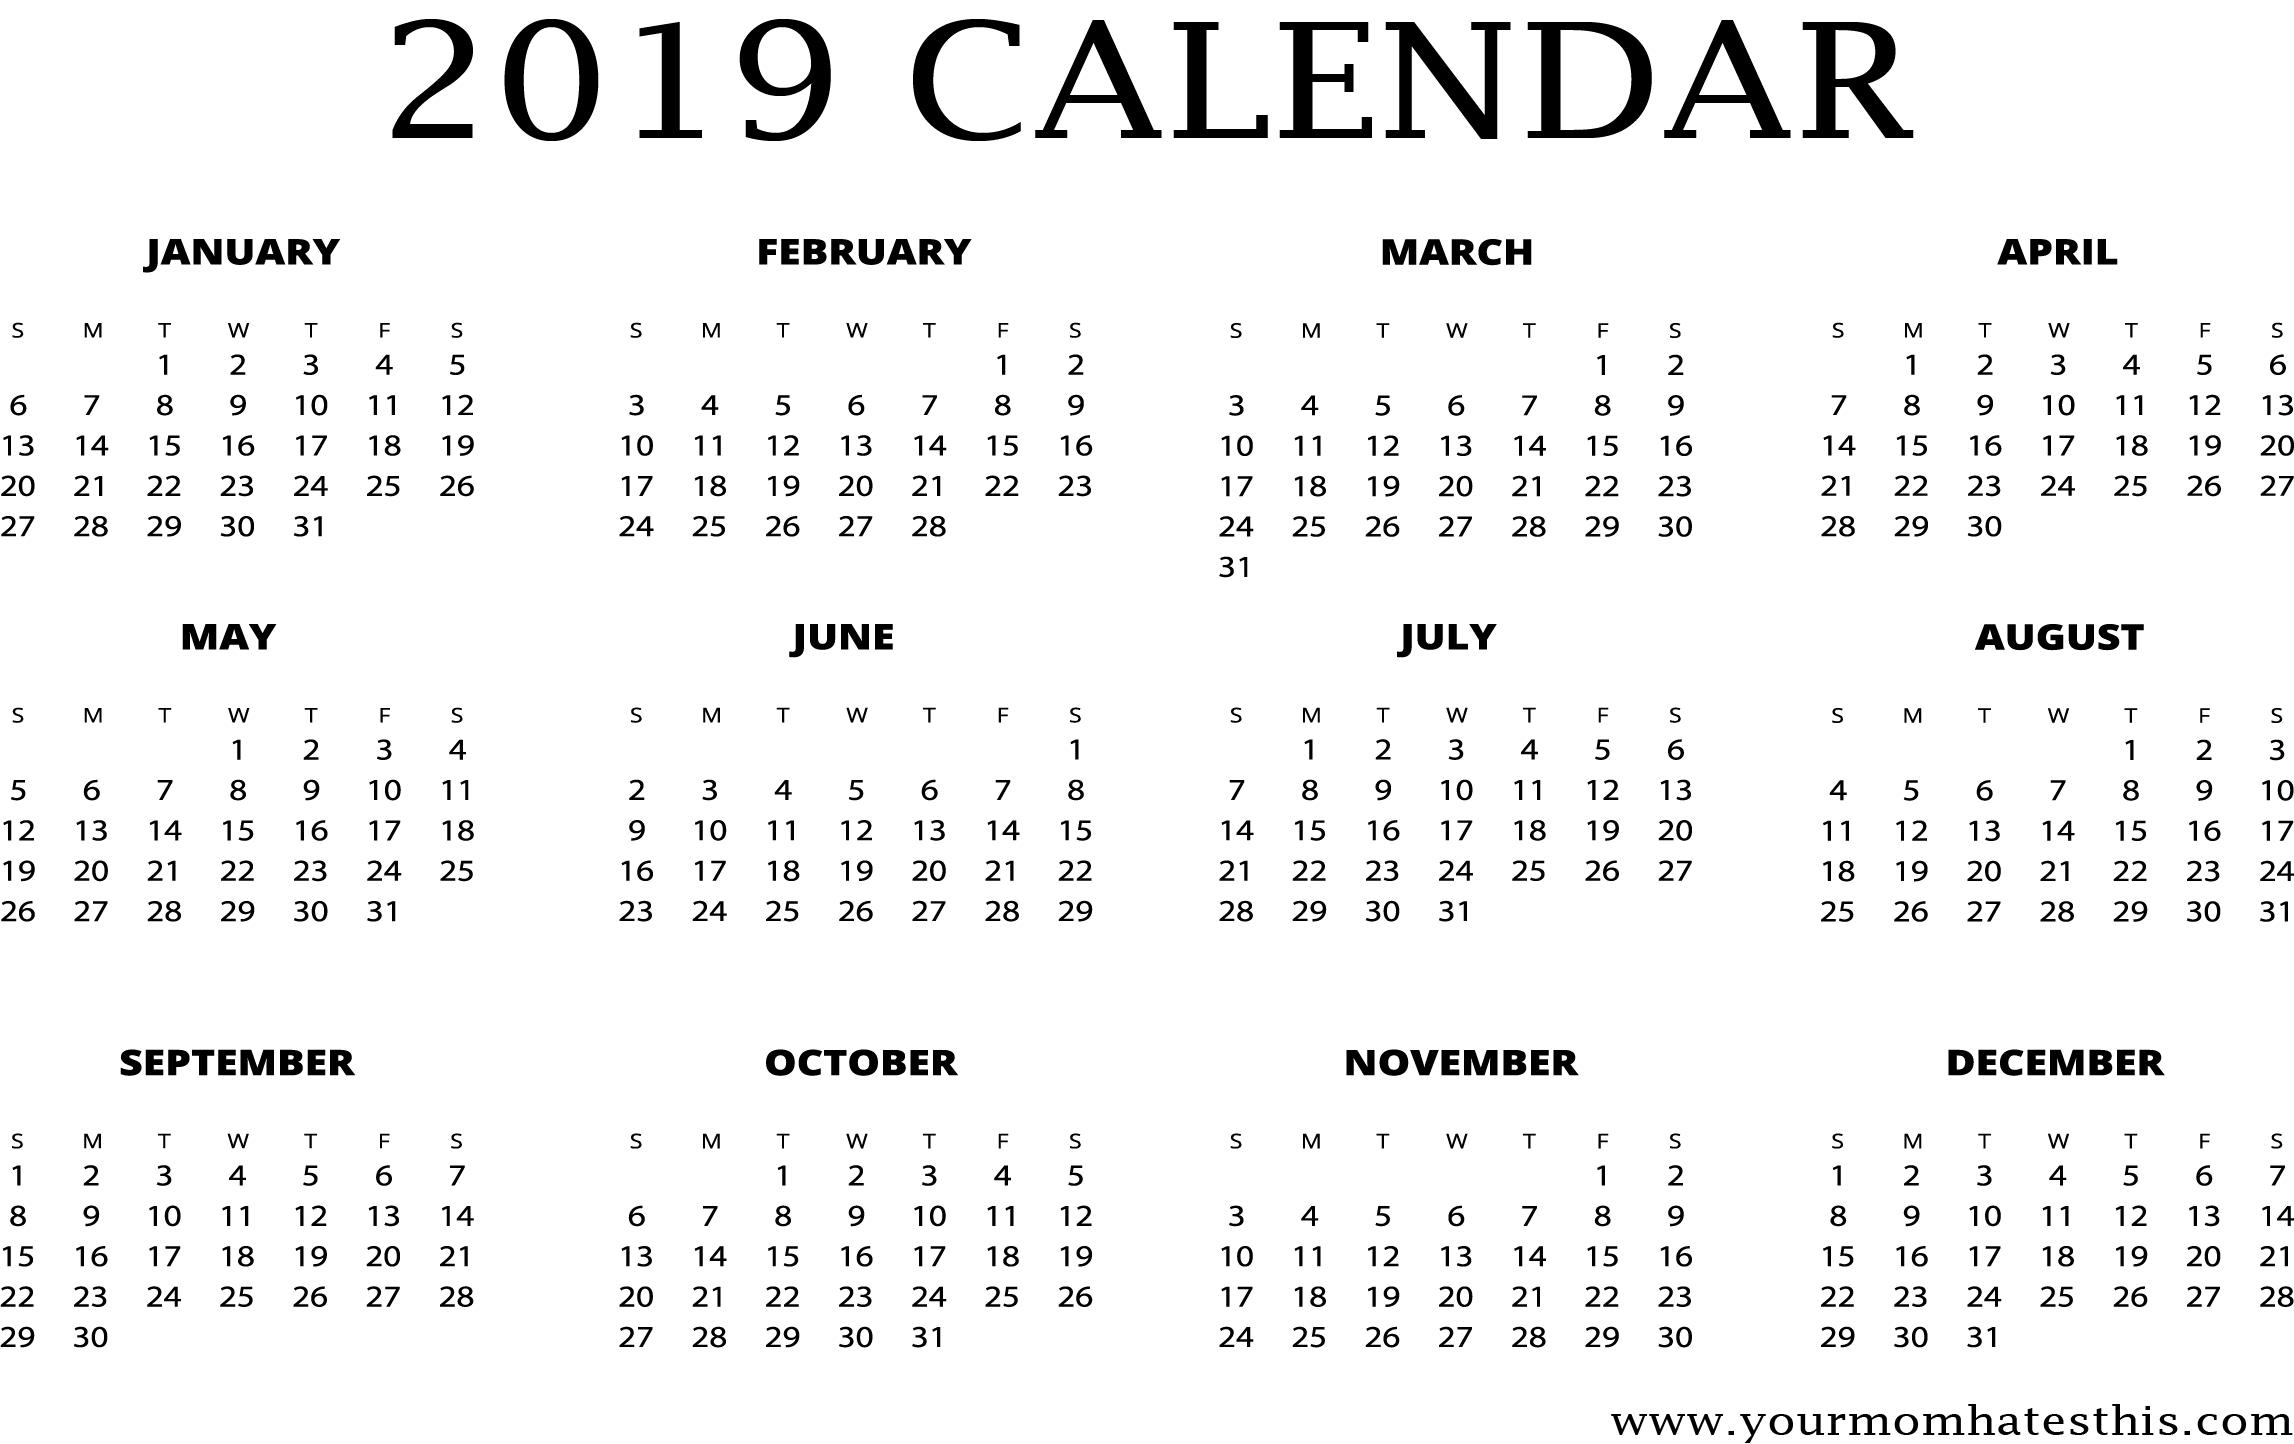 2019 Calendar Design Png